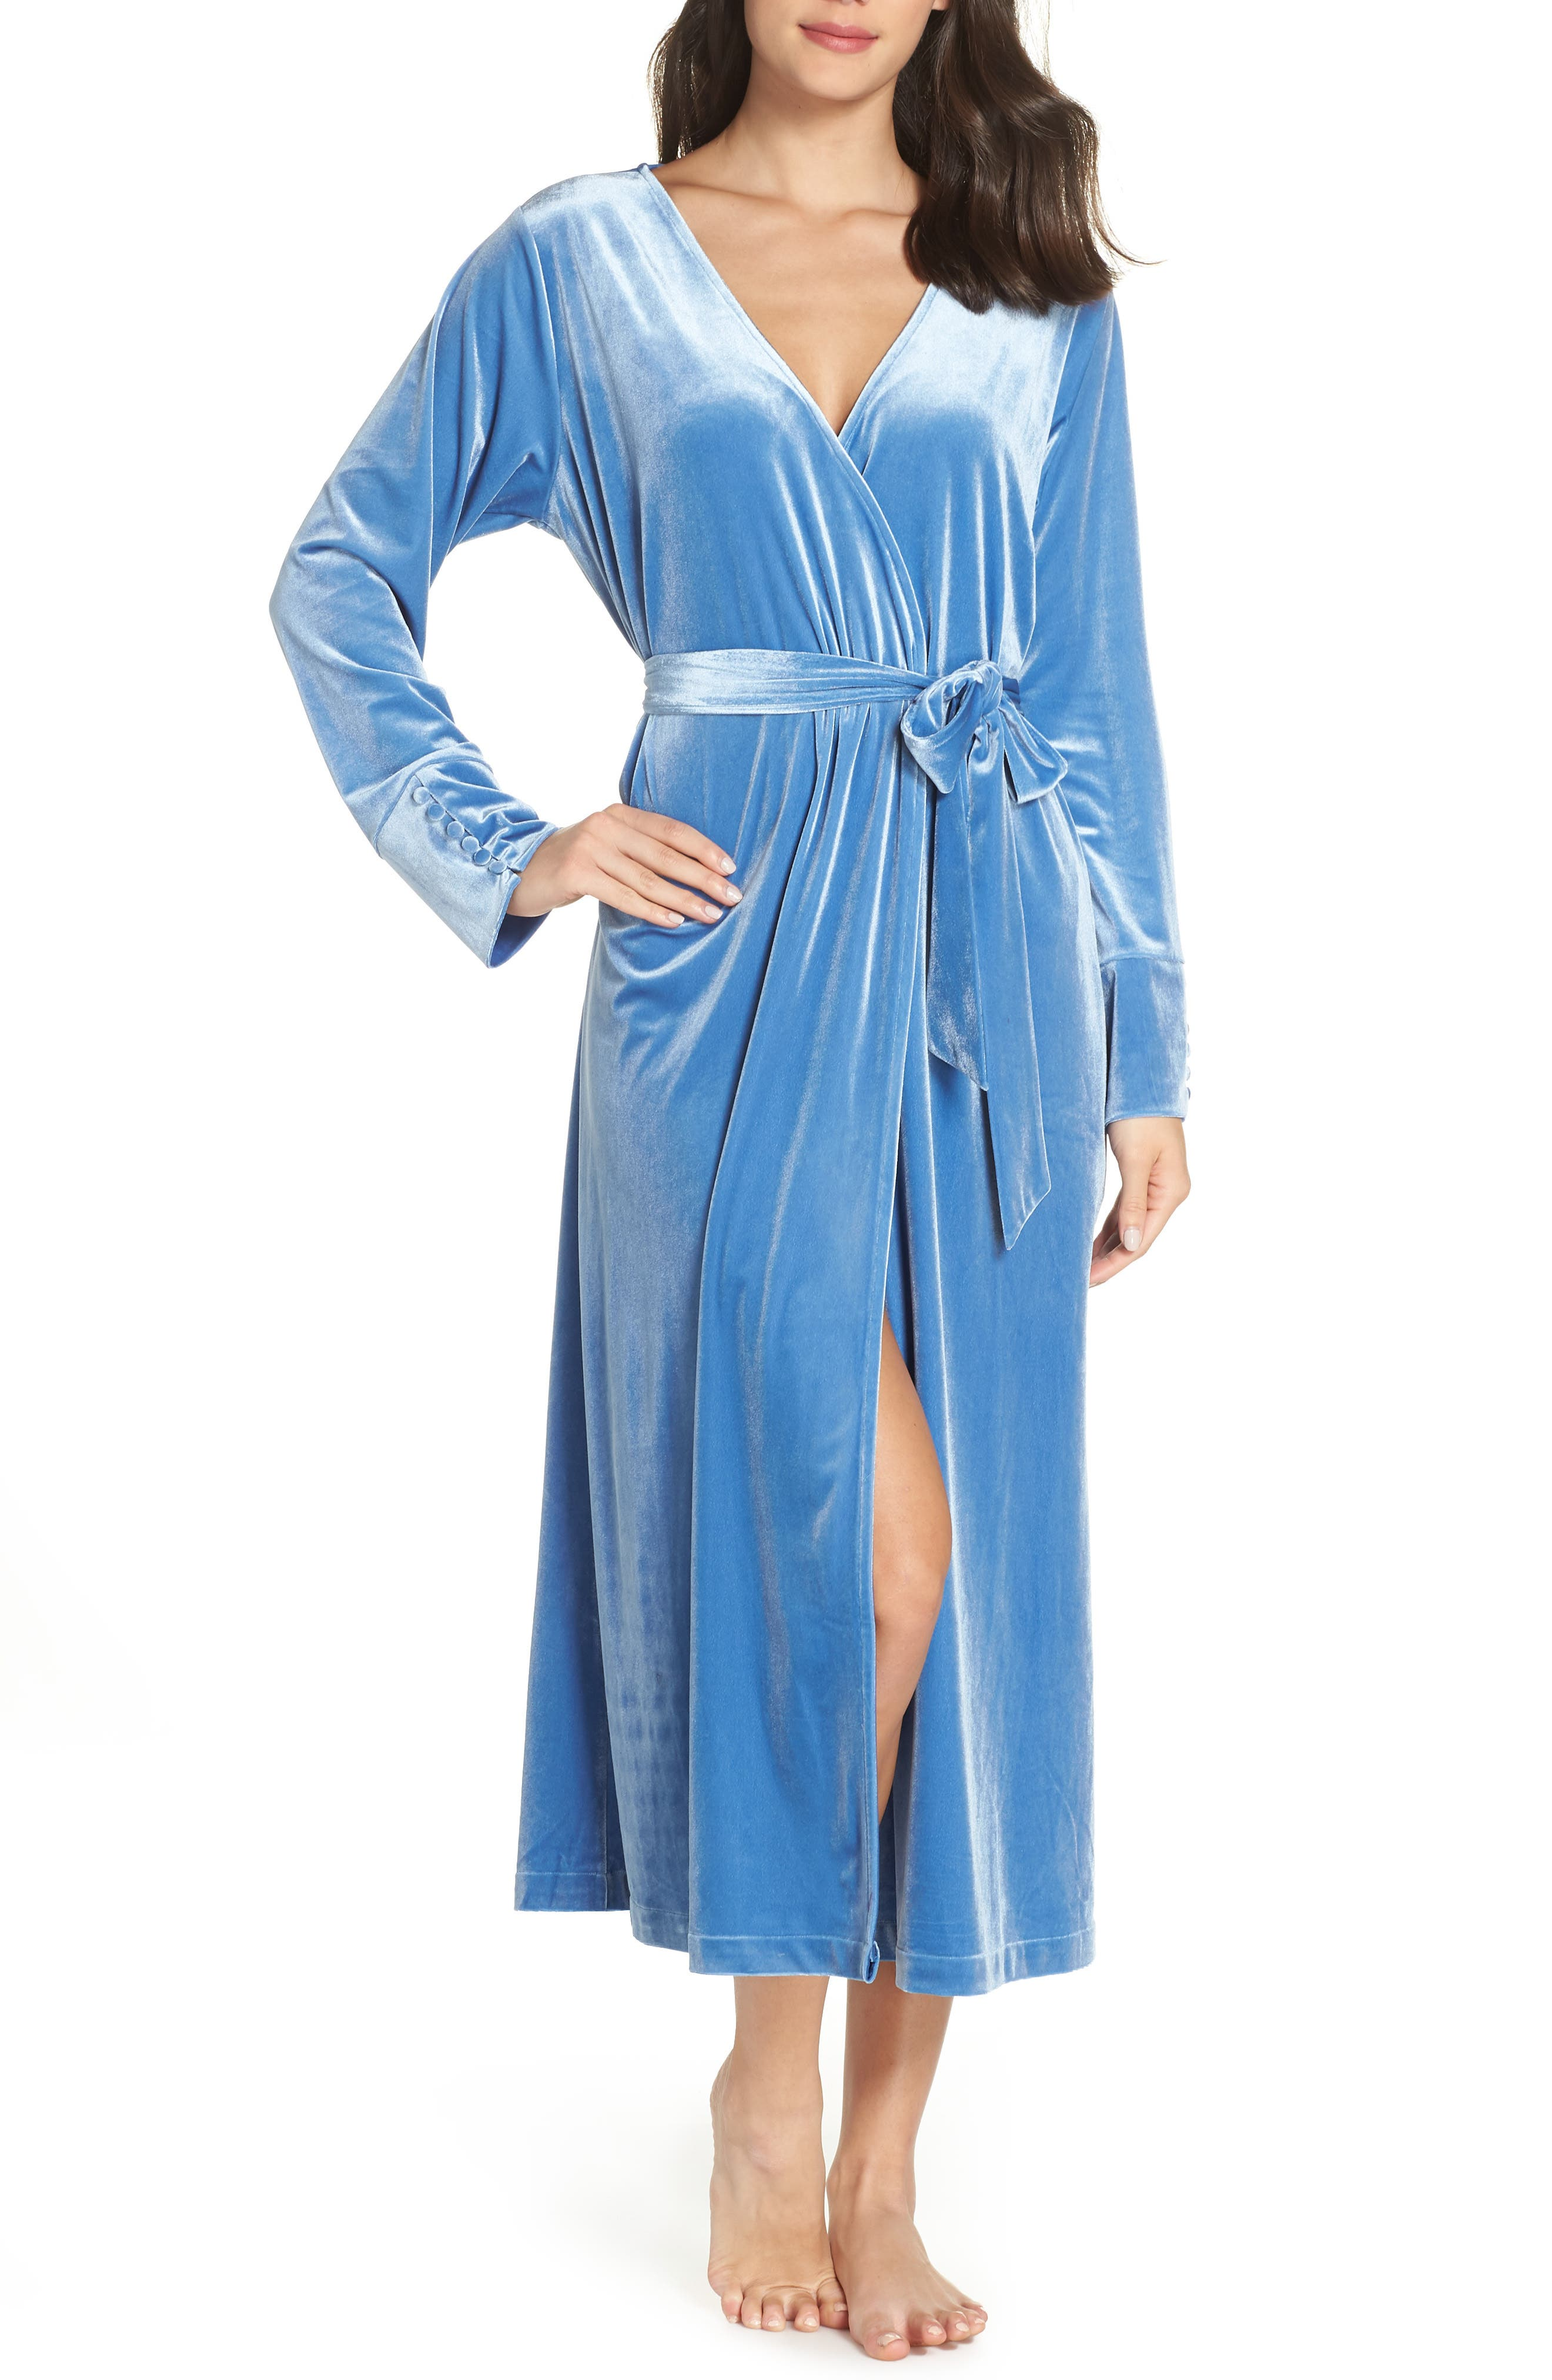 Dream Away Velour Robe,                         Main,                         color, BLUE DELFT